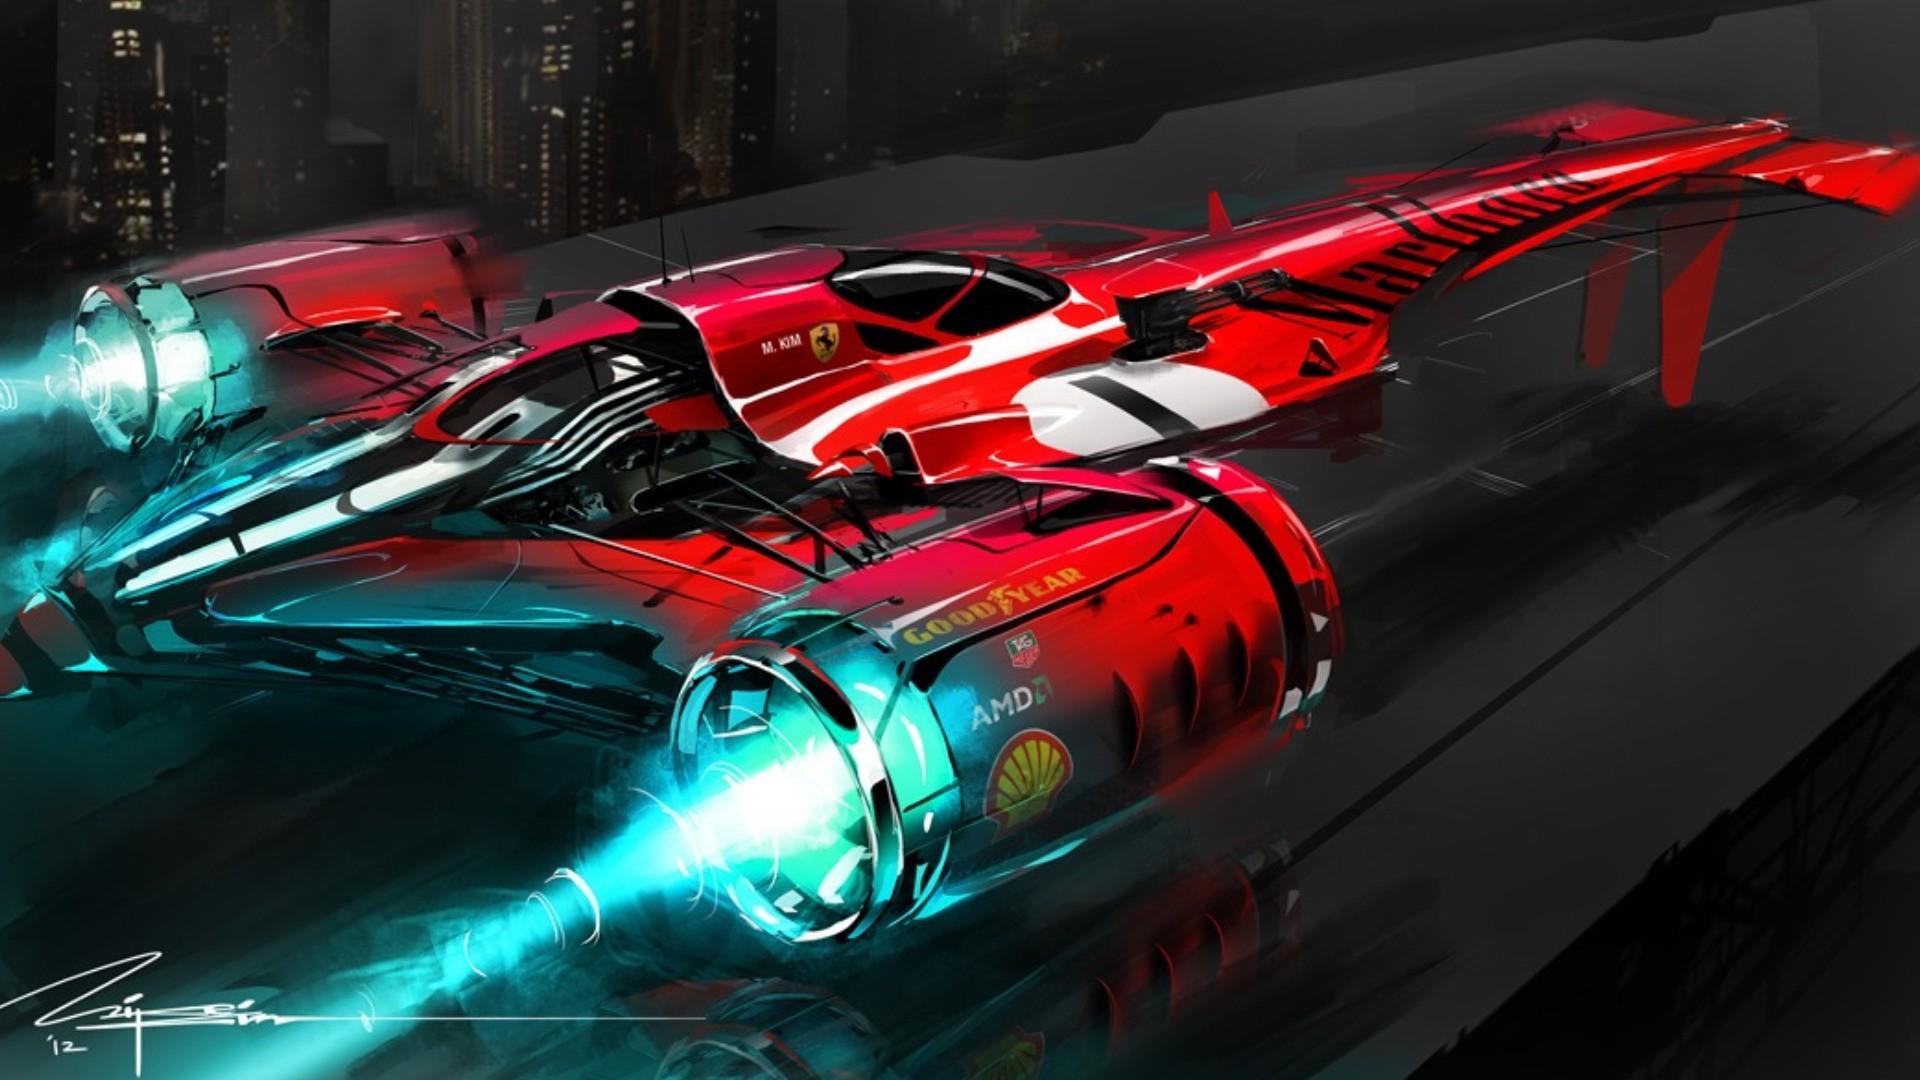 General 1920x1080 fantasy art Ferrari science fiction vehicle futuristic artwork cyan